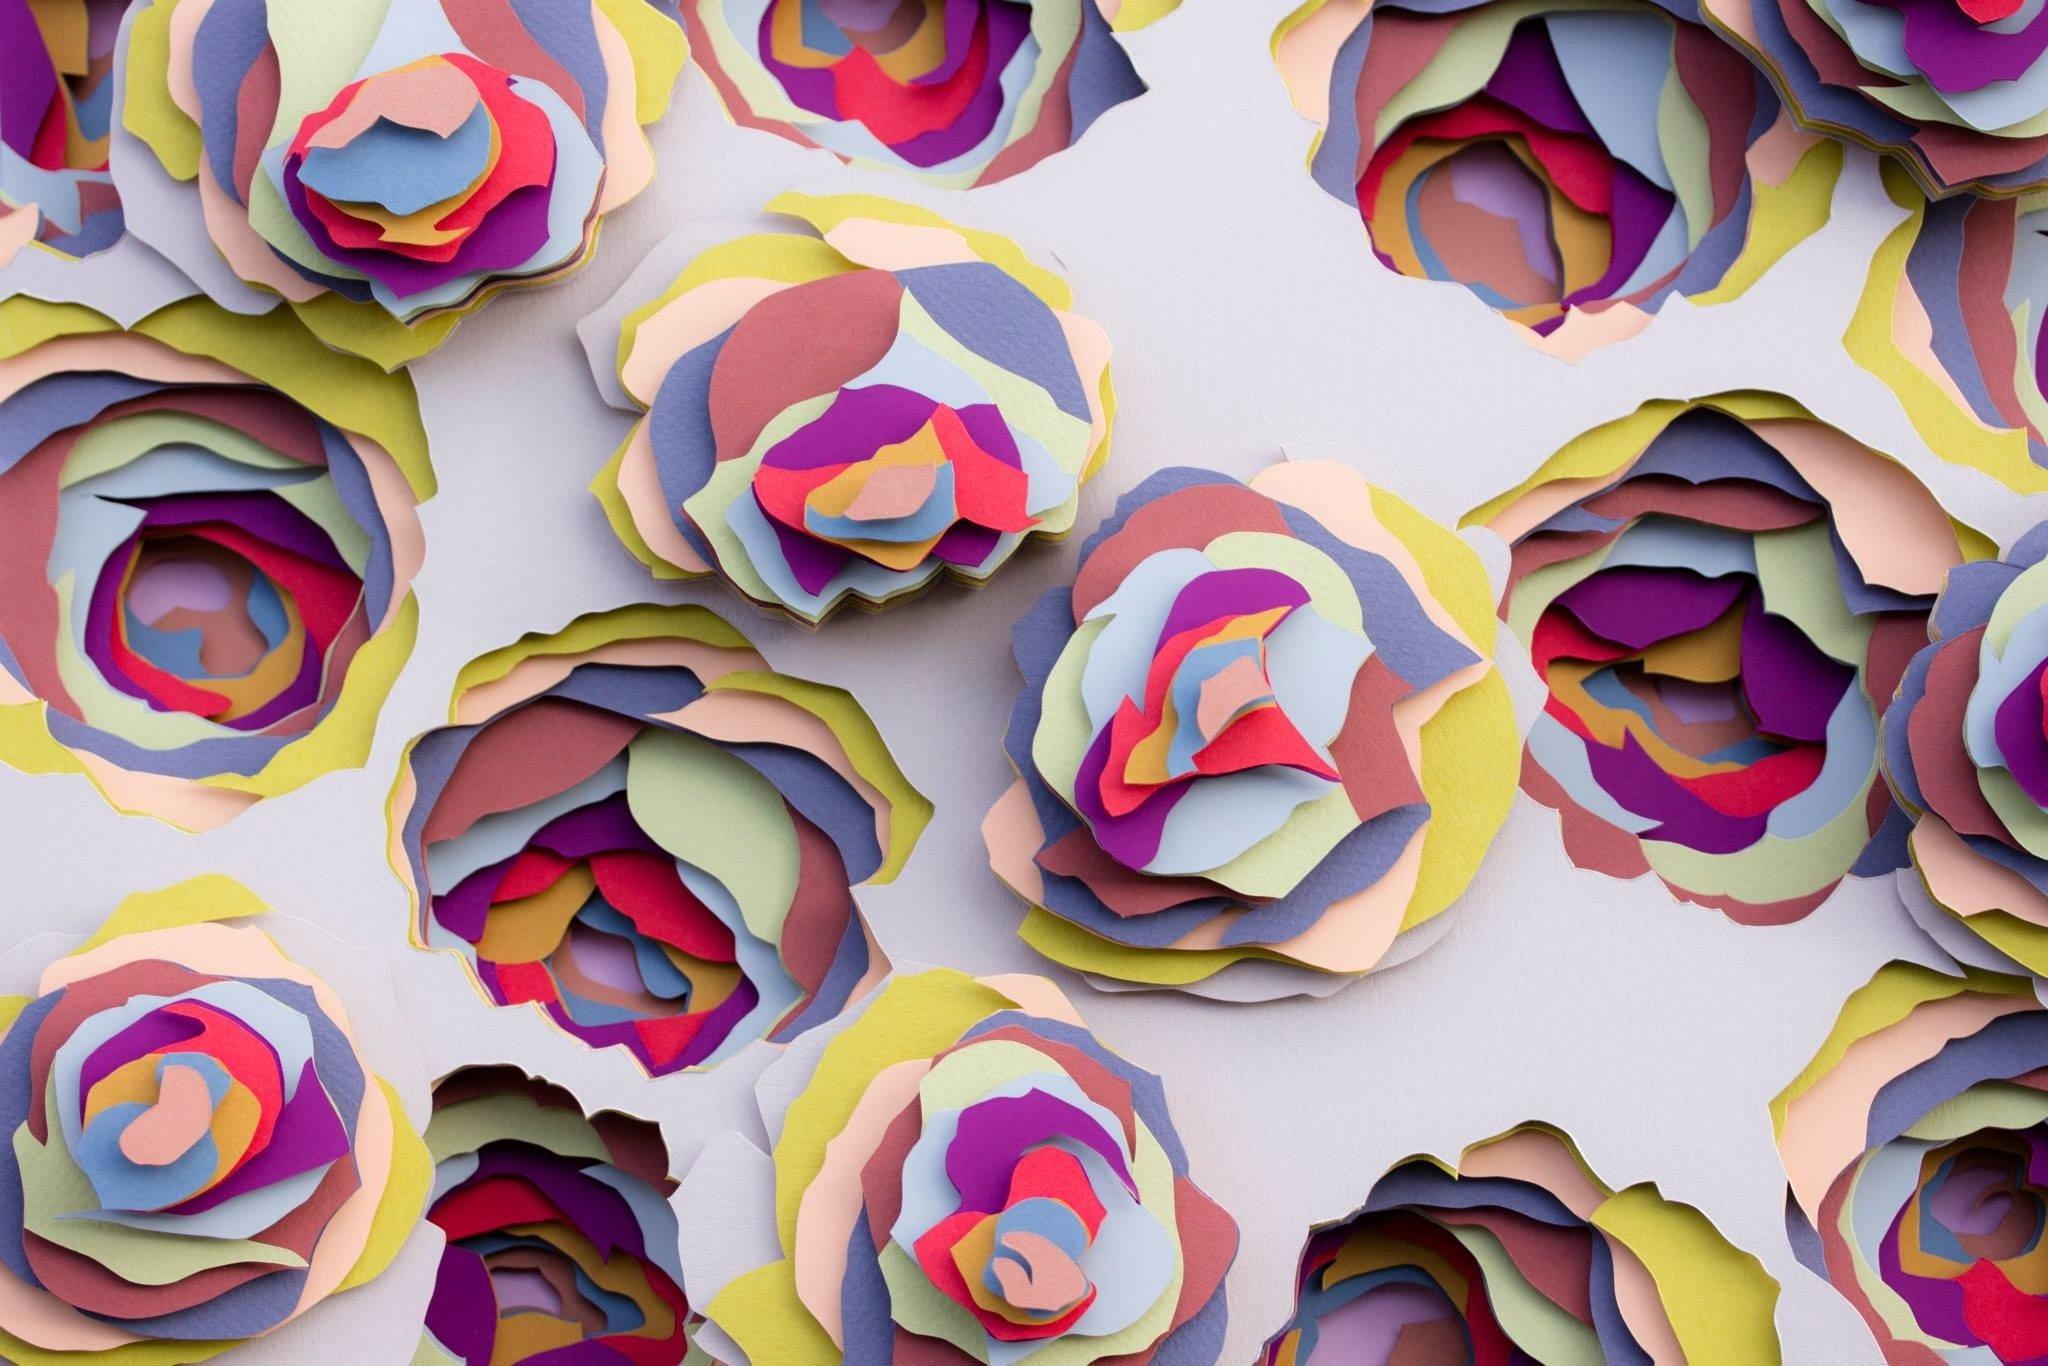 3D узоры из бумаги от художника Мода Вантура